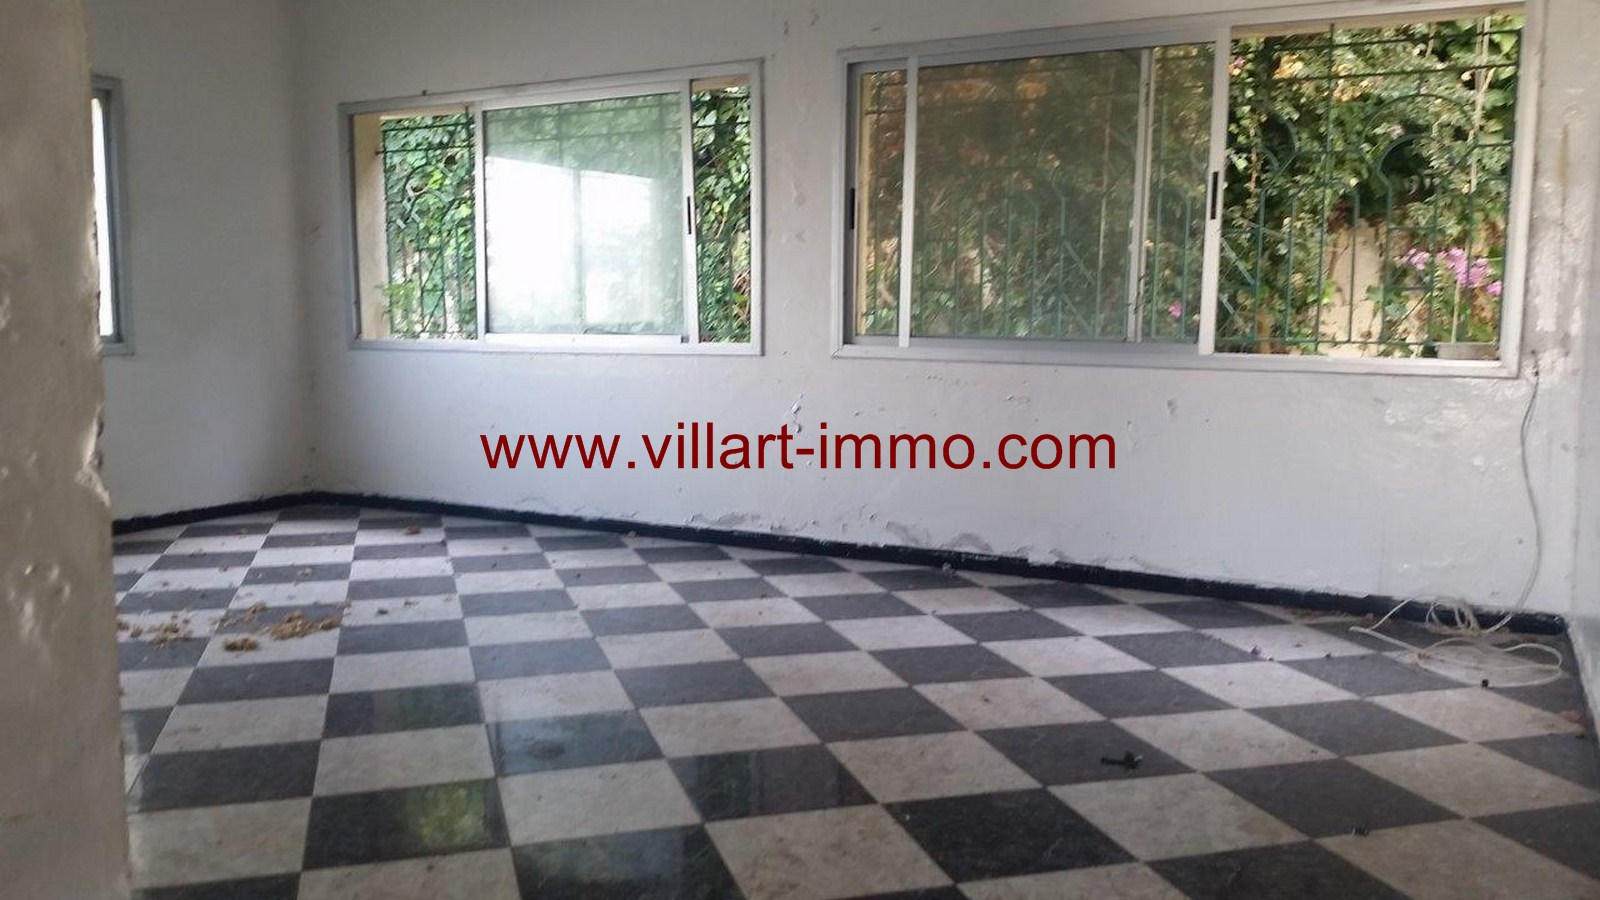 7-vente-maison-tanger-marchan-salon-2-vm381-villart-immo